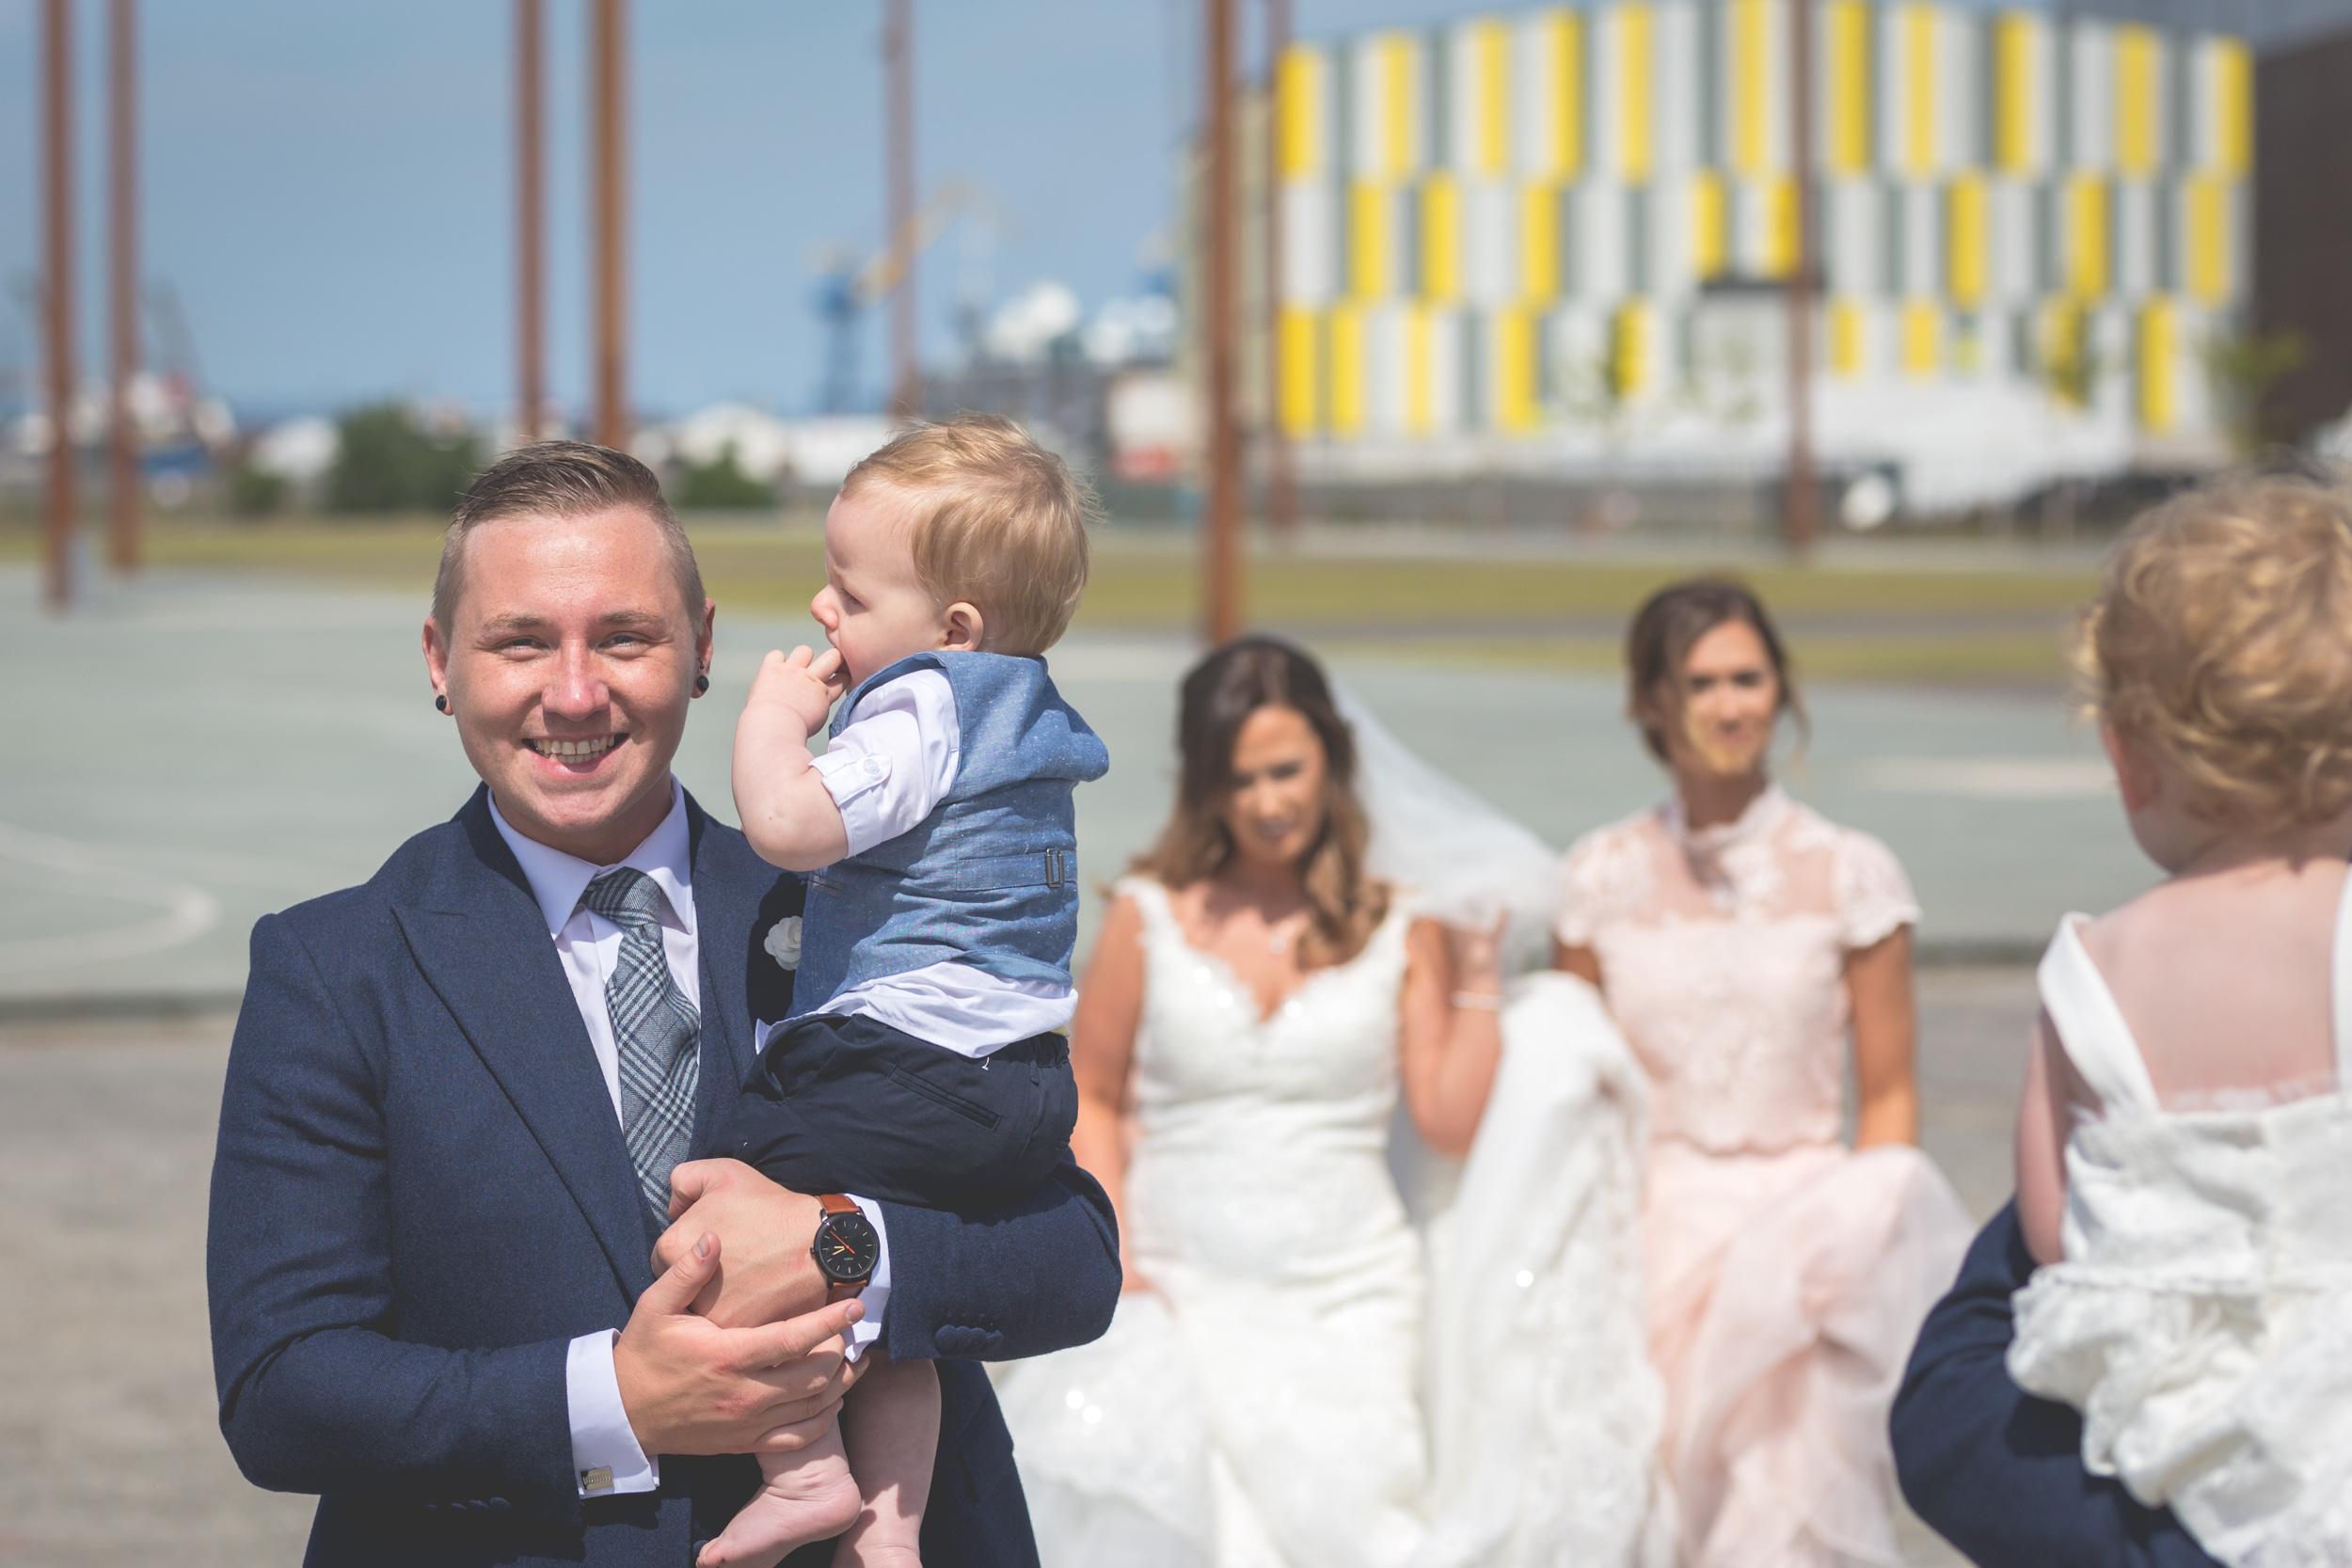 Brian McEwan   Northern Ireland Wedding Photographer   Rebecca & Michael   Portraits-53.jpg